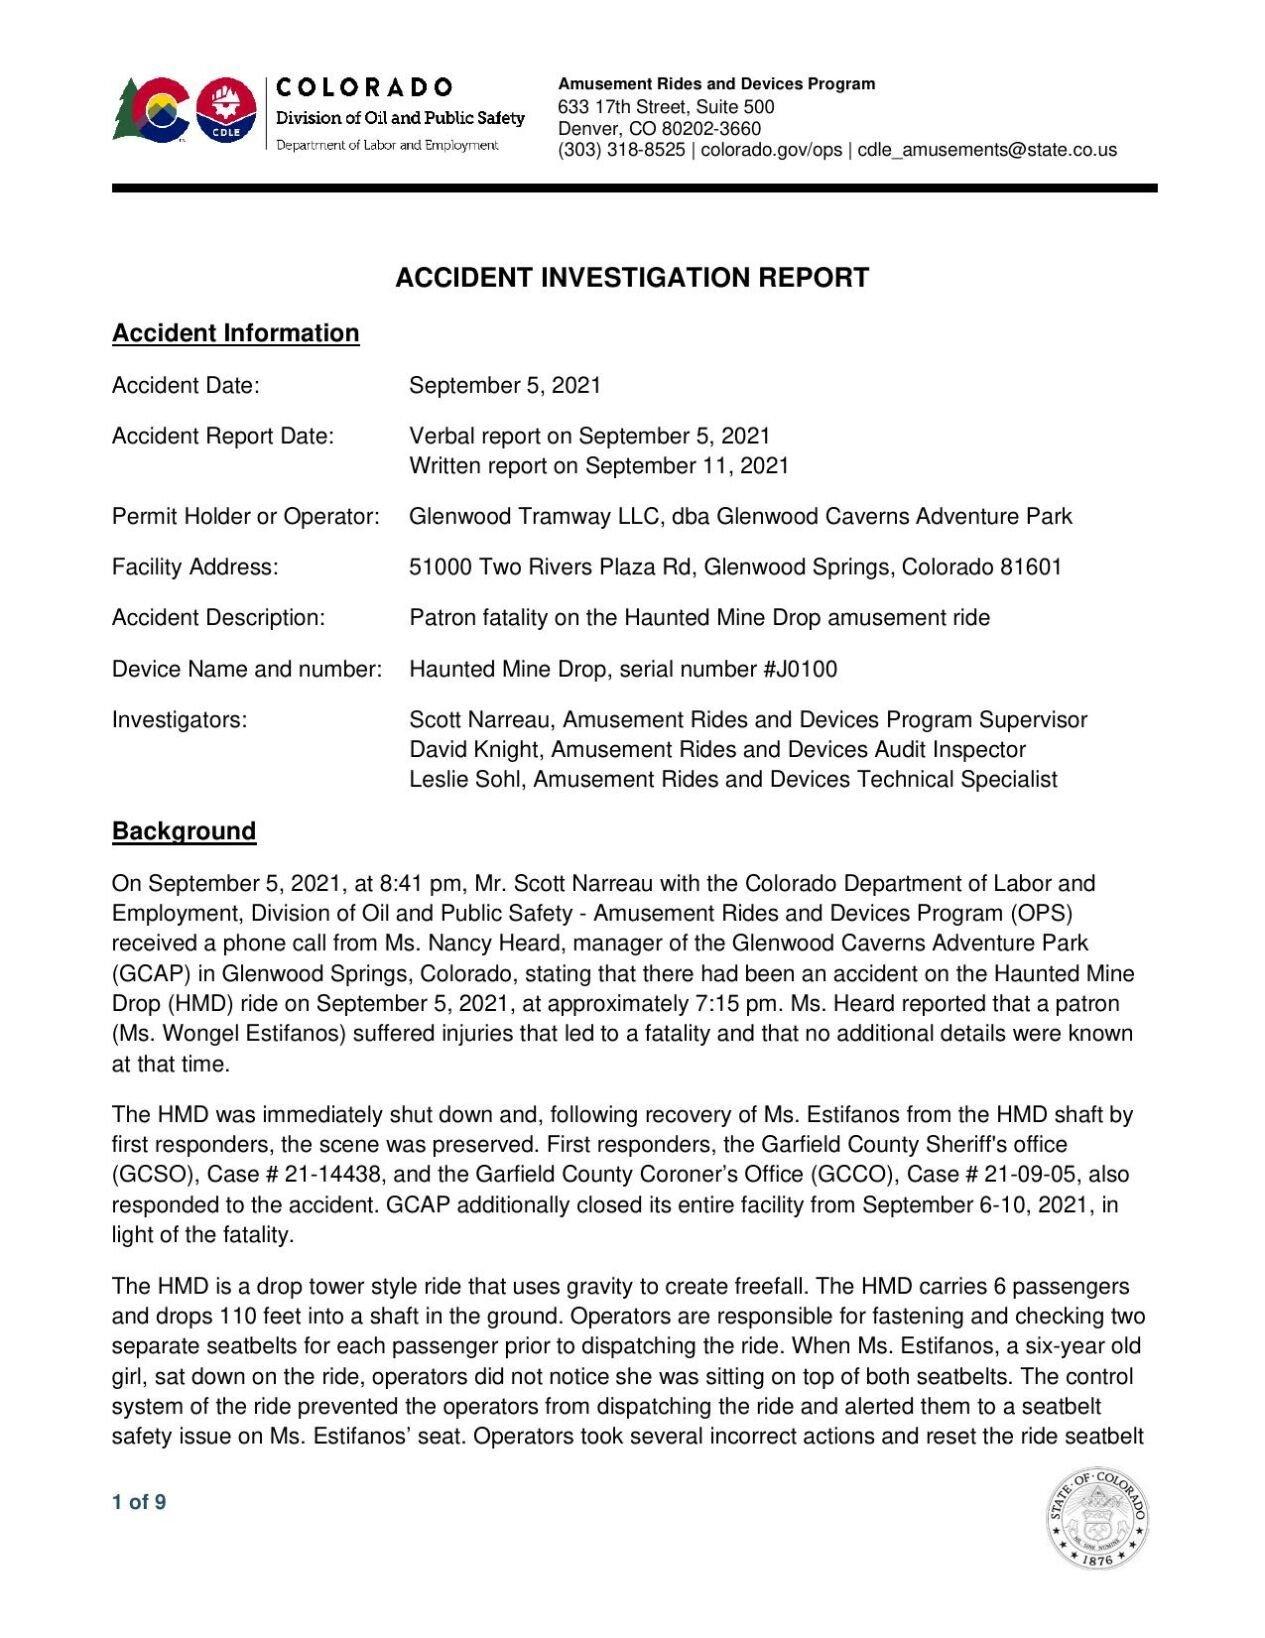 Glenwood caverns accident investigation report